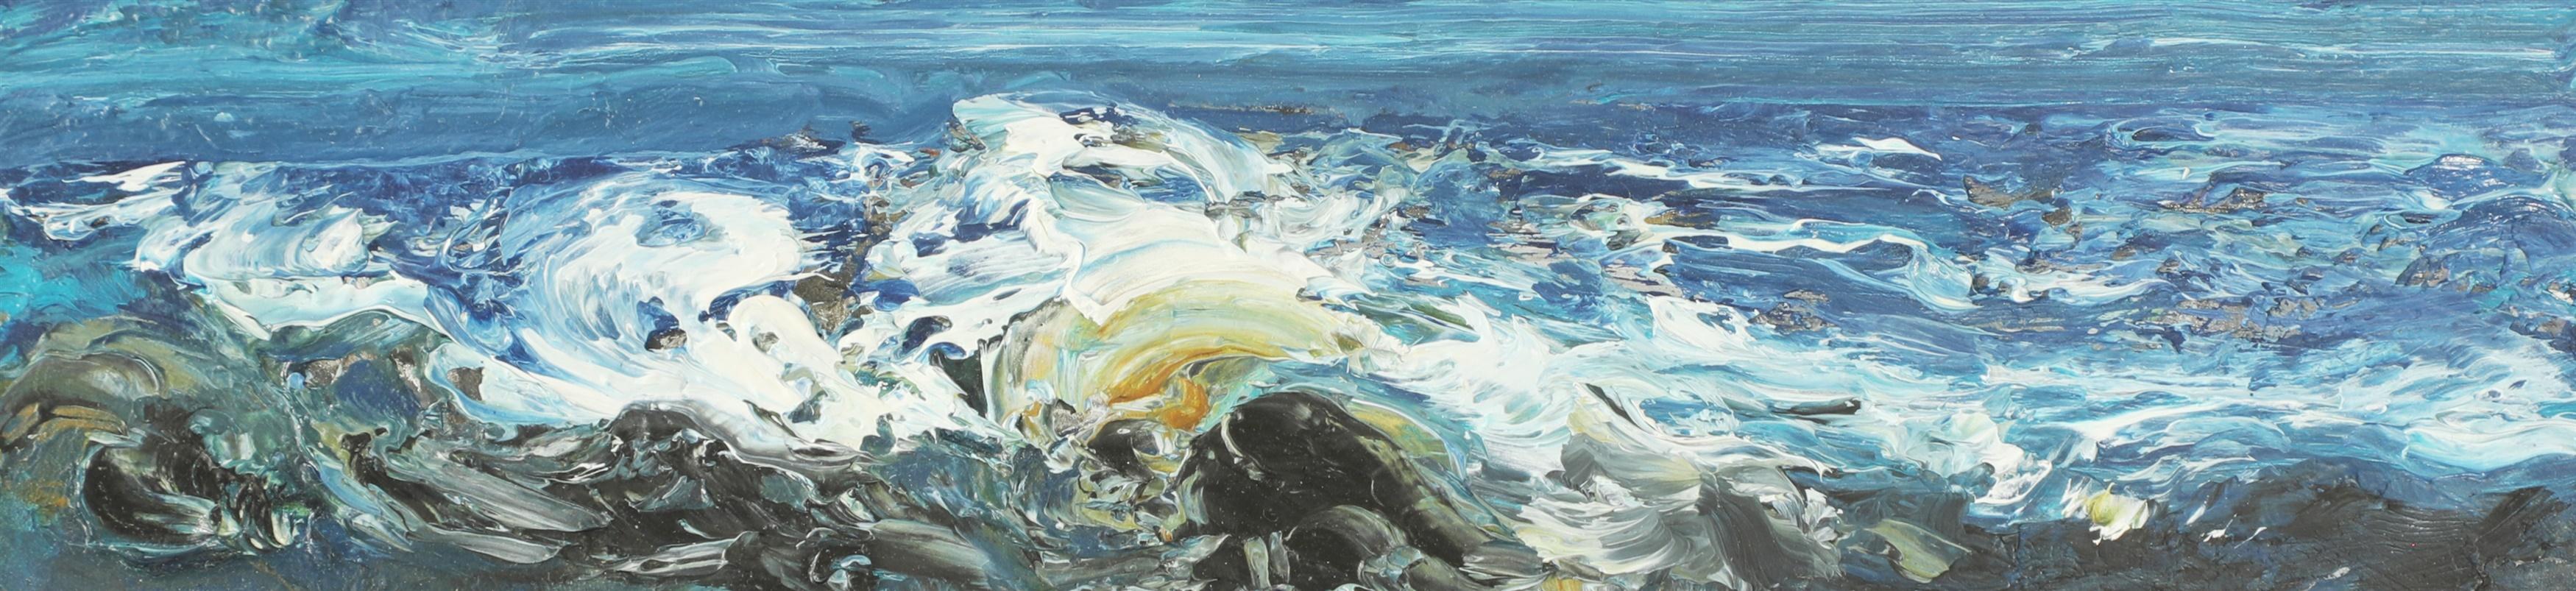 Maggi Hambling, portrait of the sea